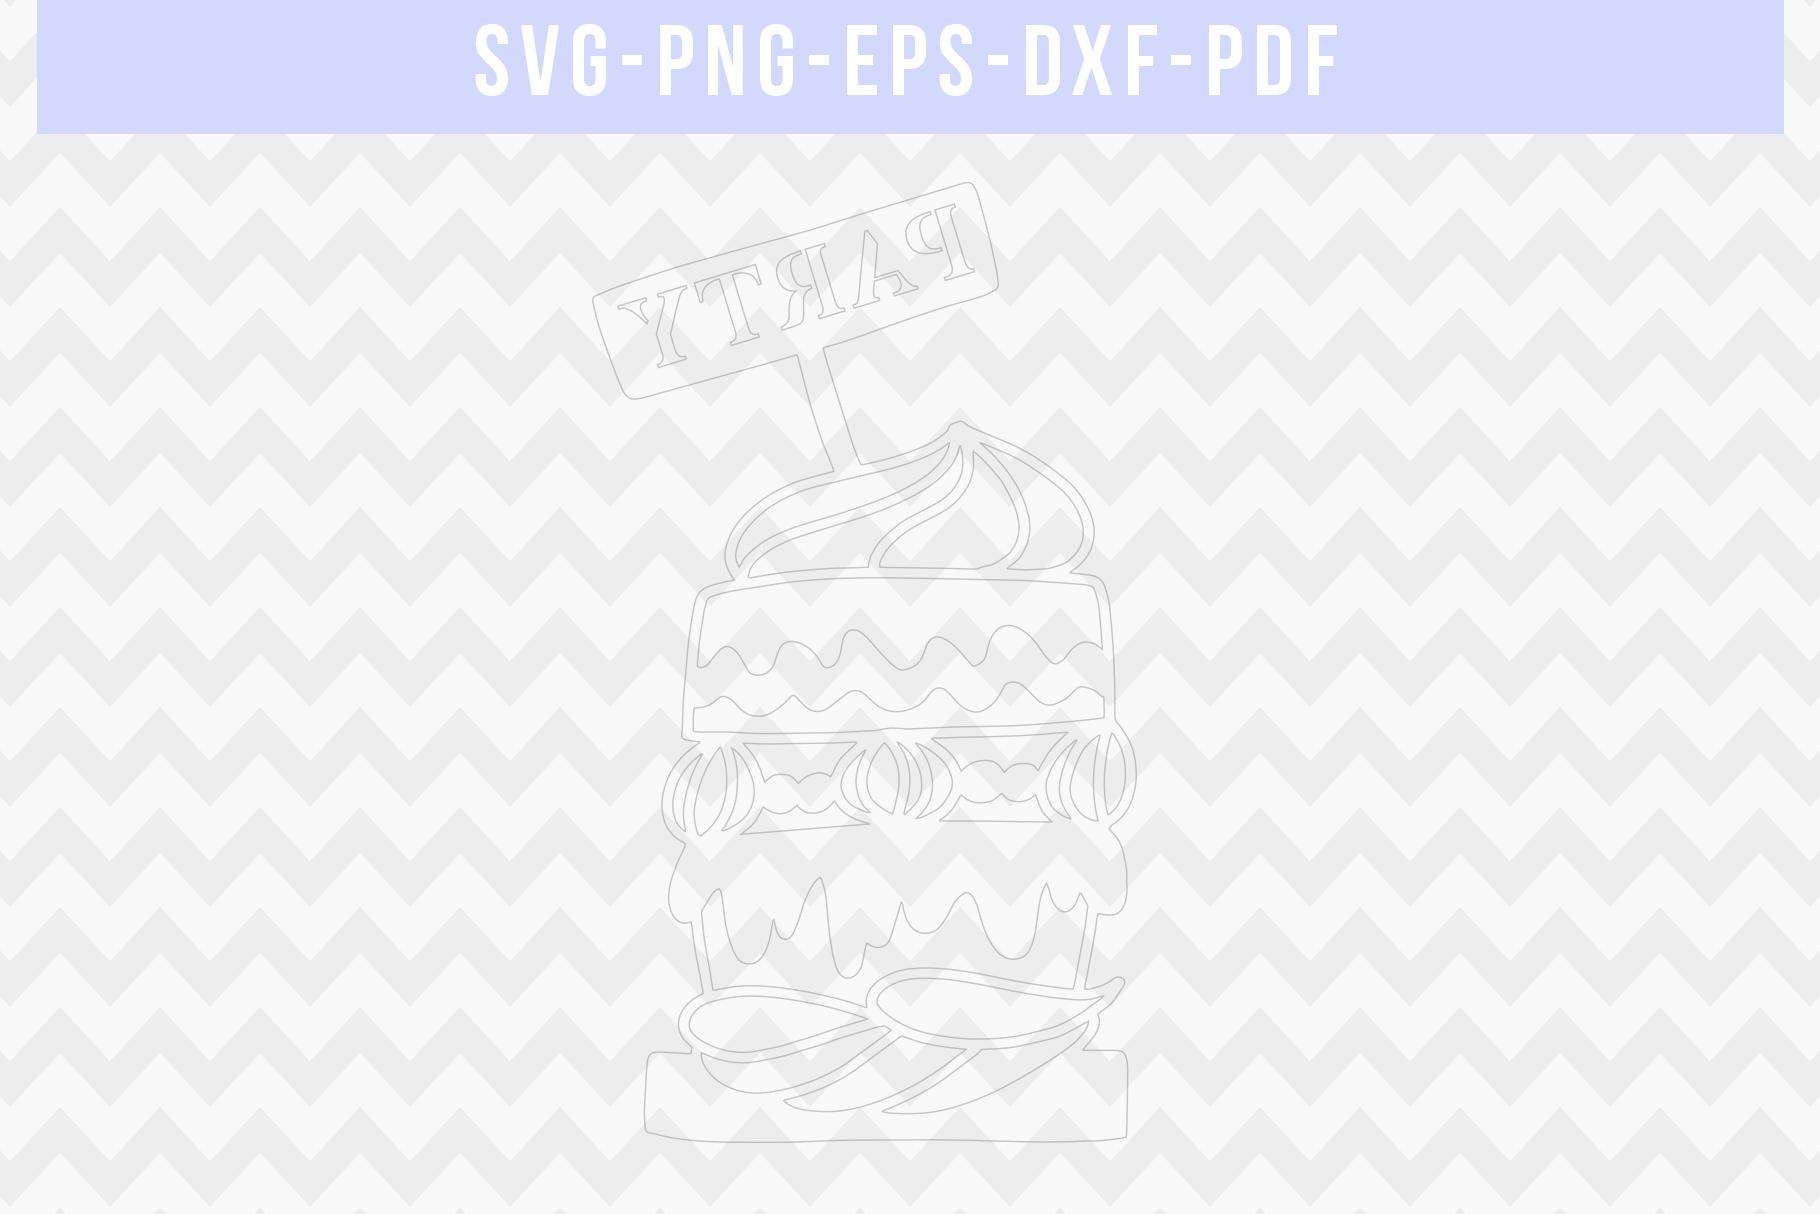 Cake Papercut Template, Birthday Party Invitation SVG, PDF example image 2